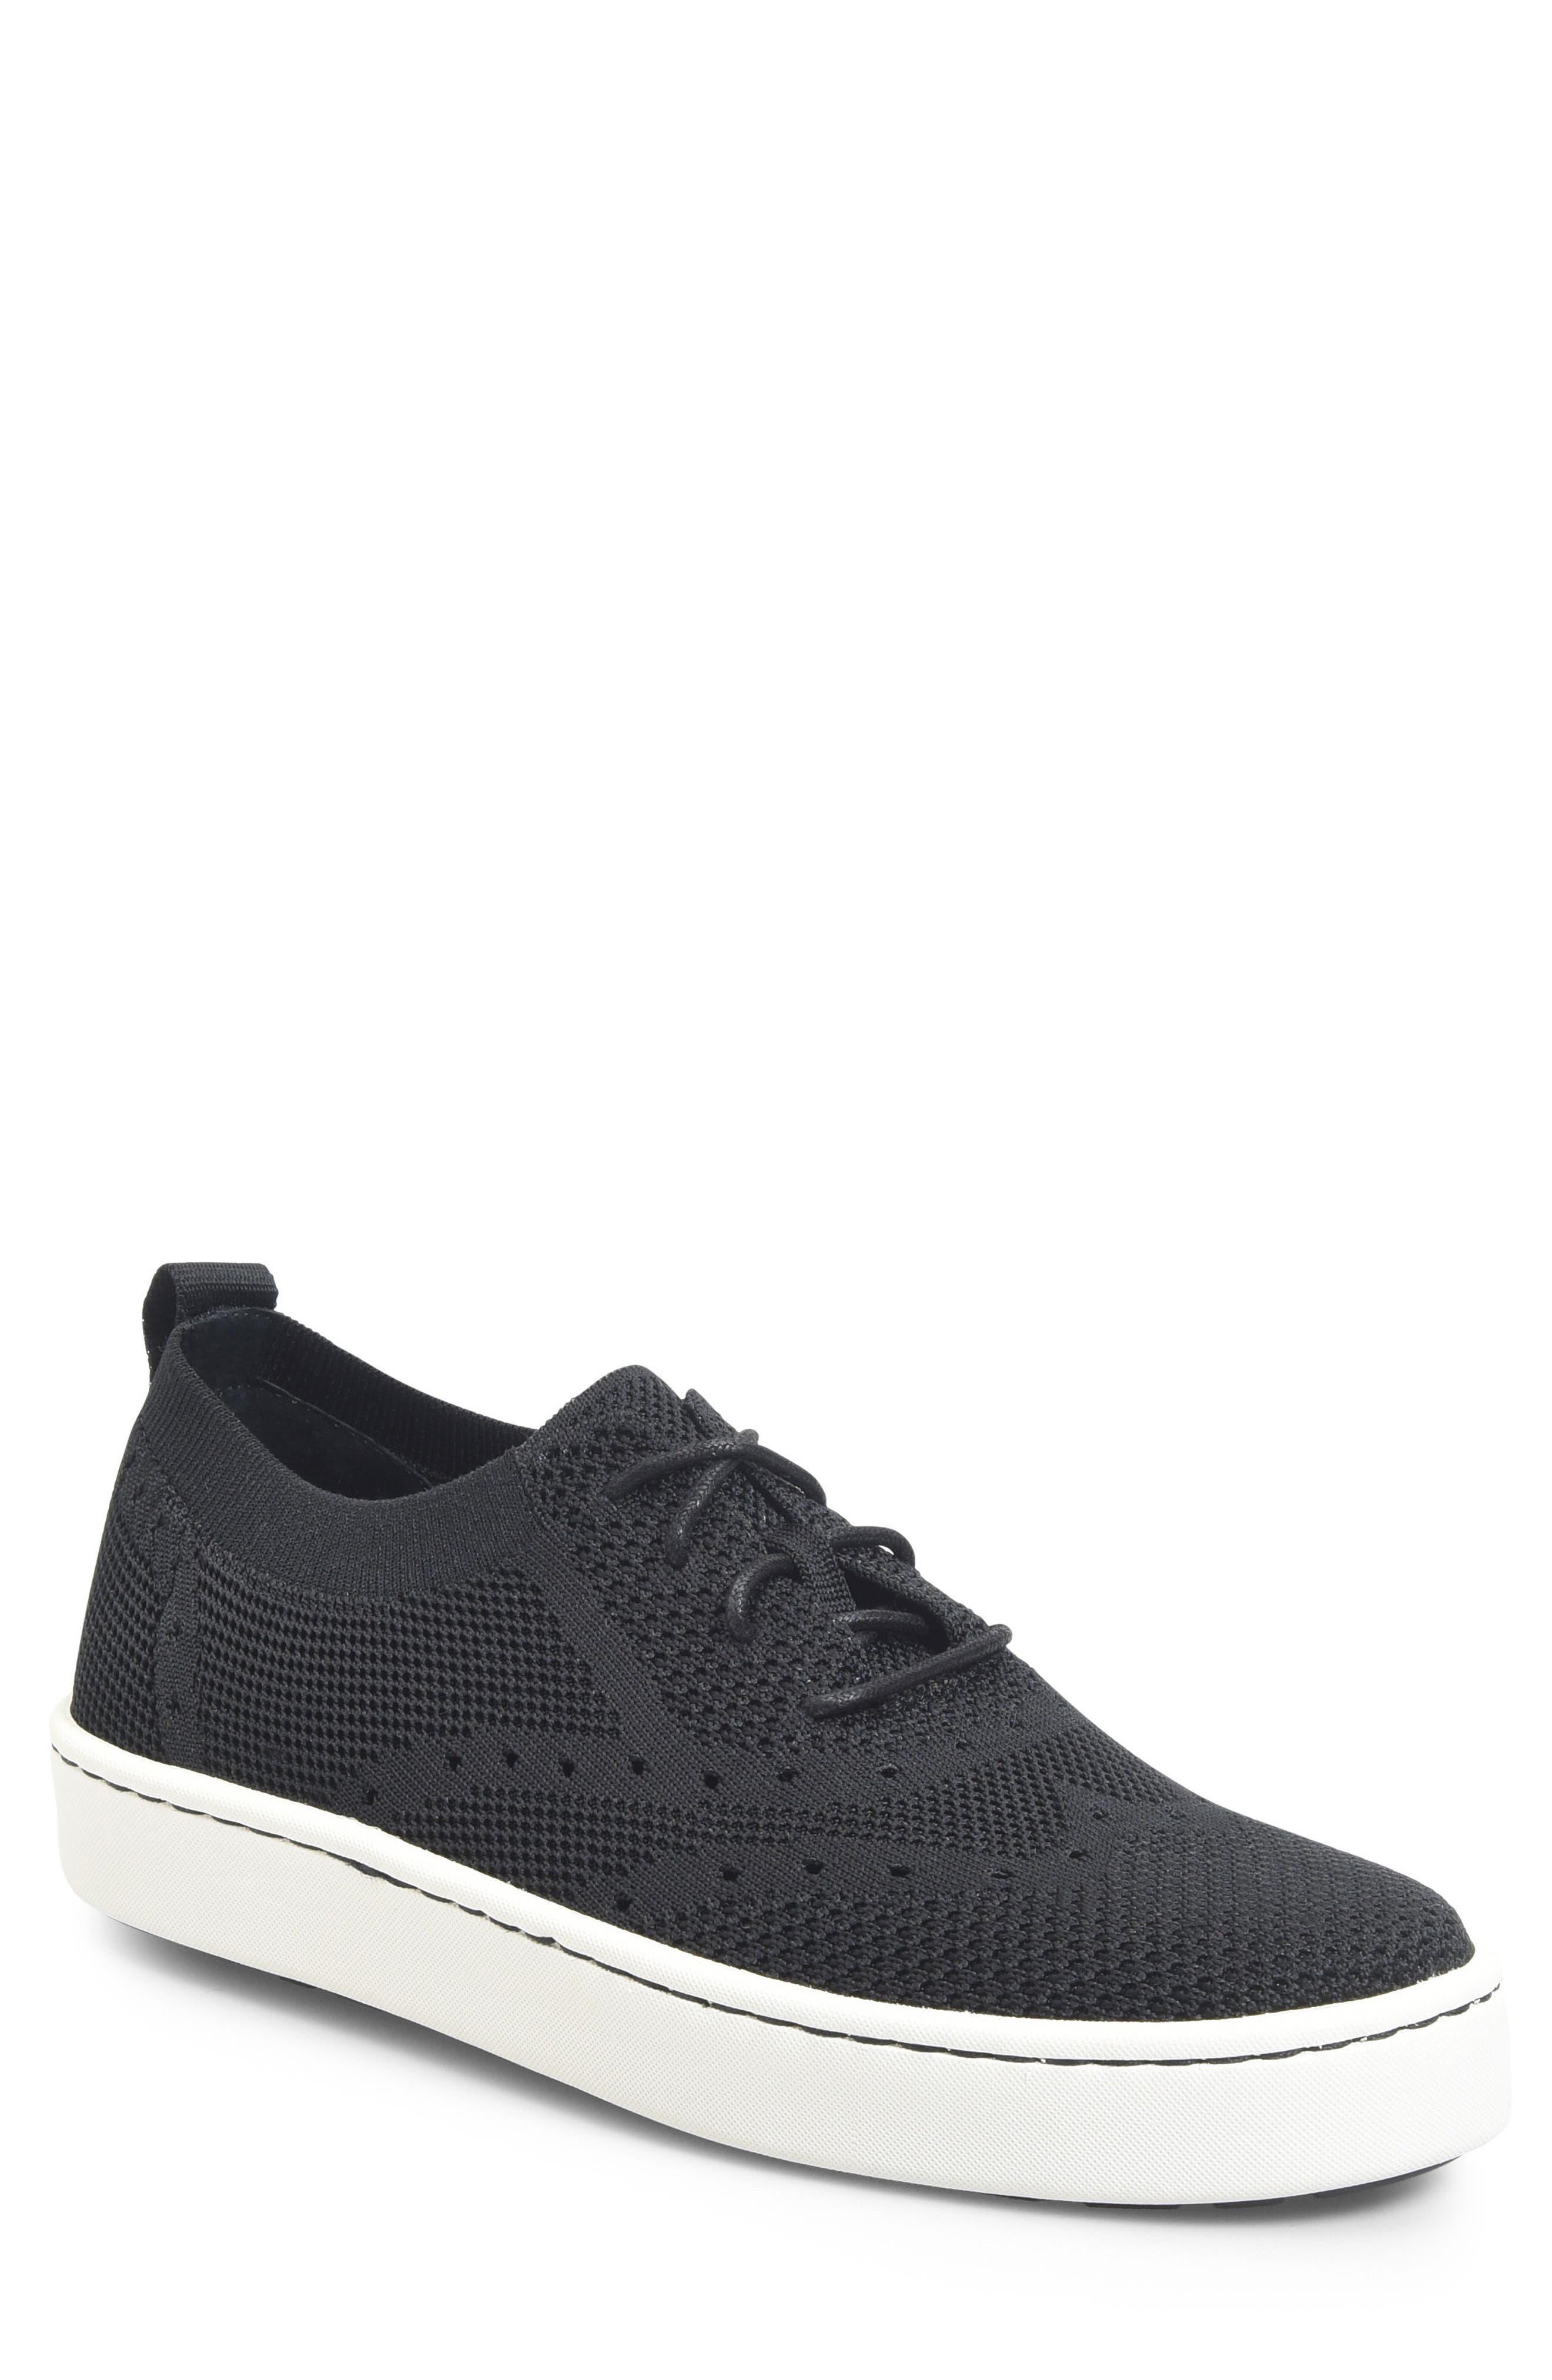 Bearse Sneaker,                         Main,                         color, Black Knit